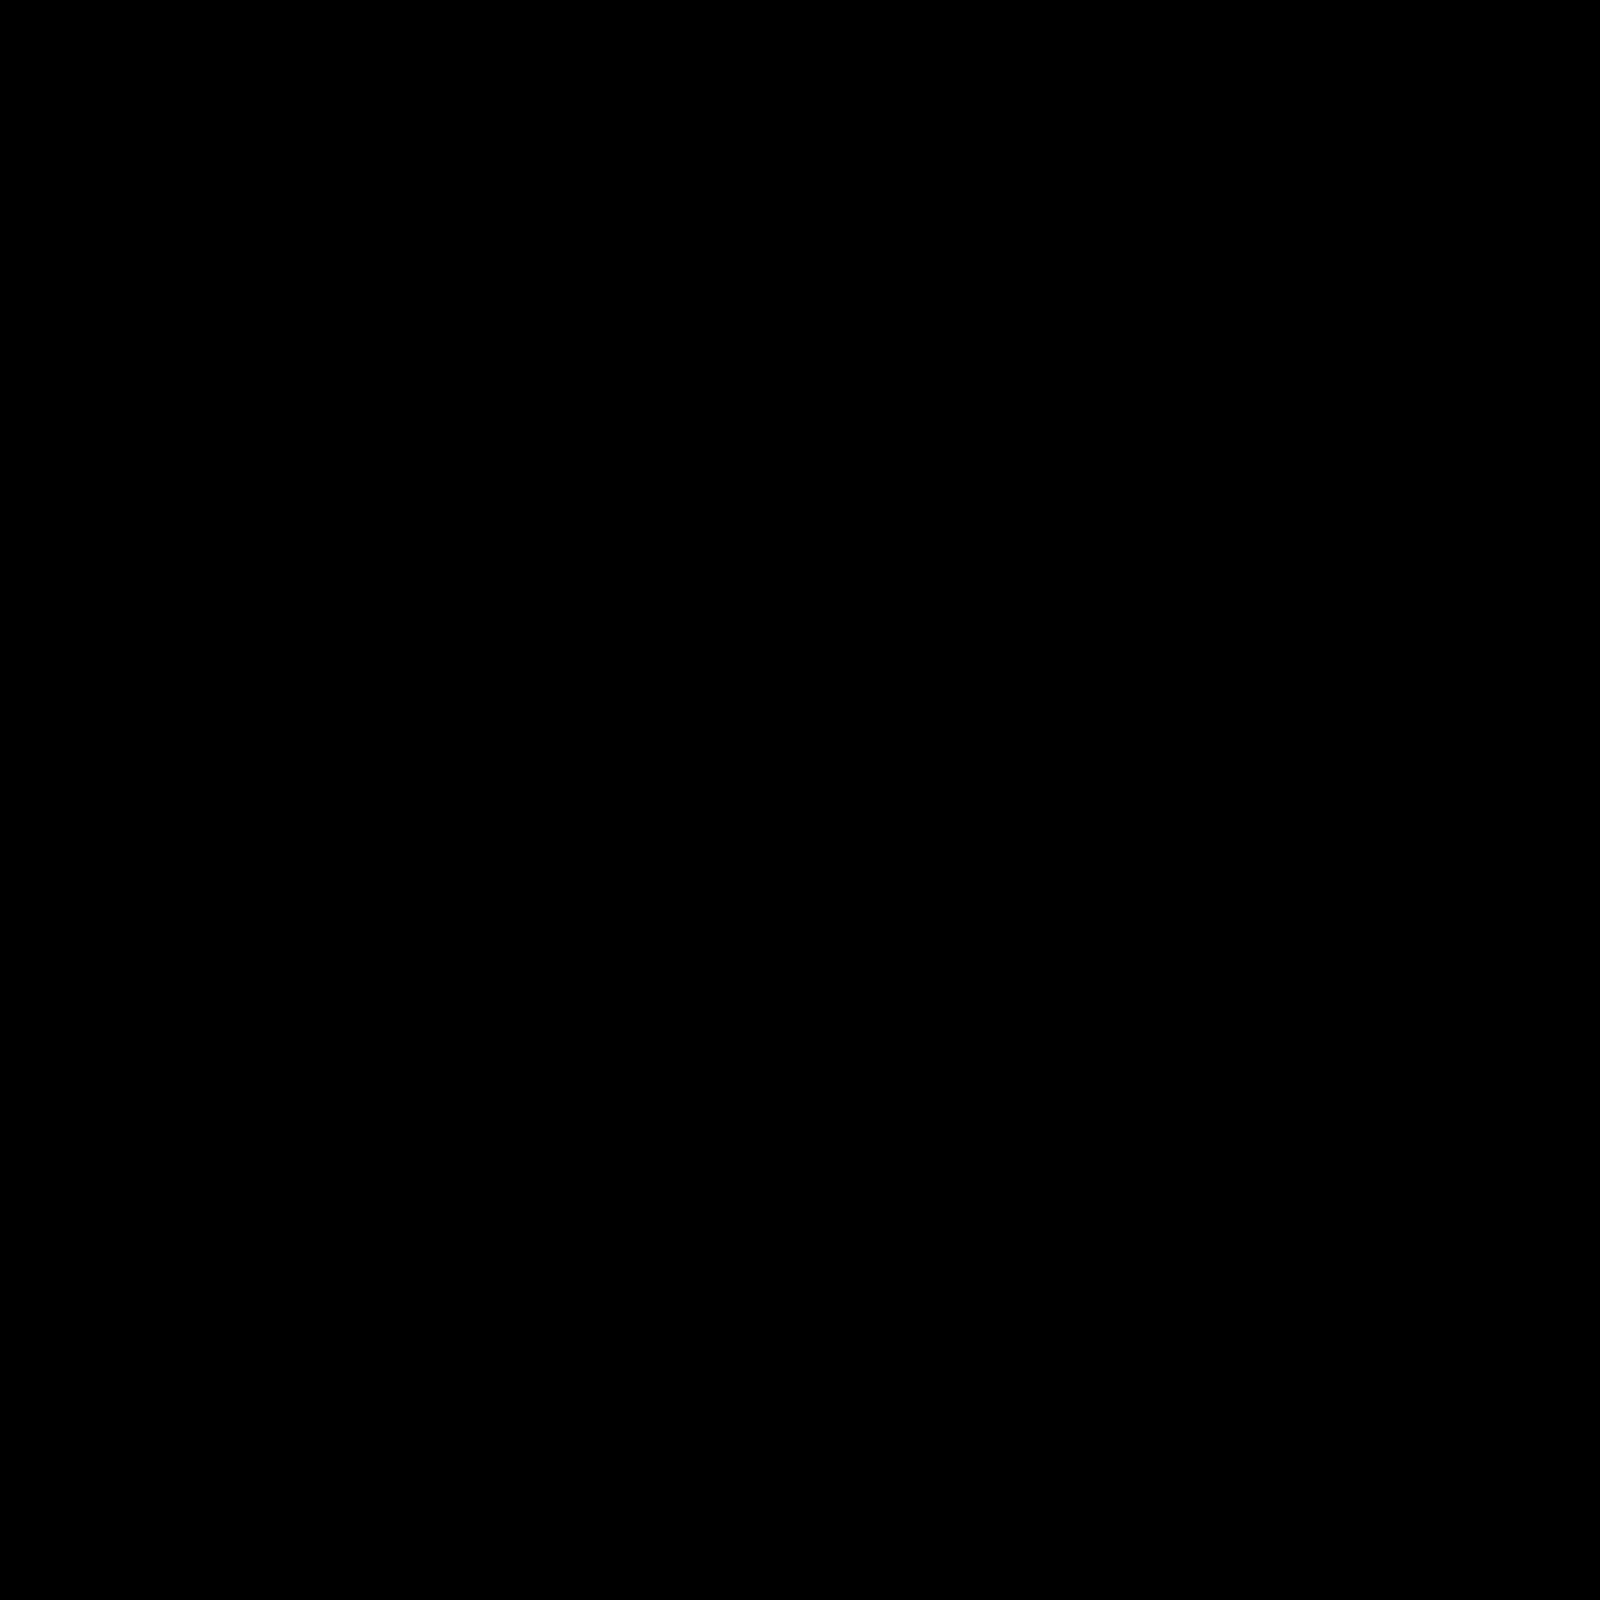 Little Black Dress icon